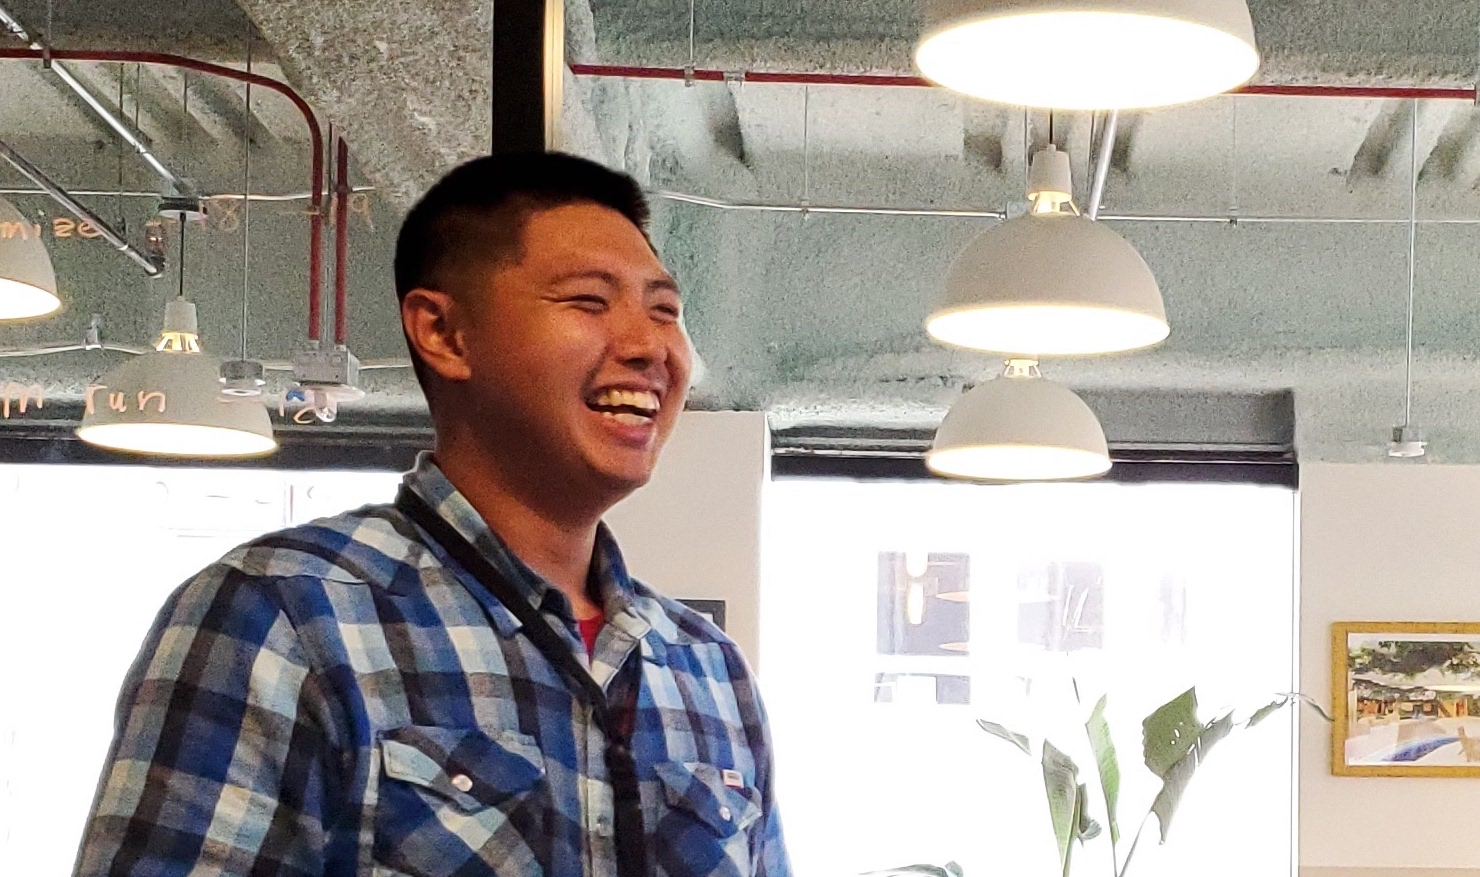 San Francisco Tech Startup Kintone Intern Hirofumi-1